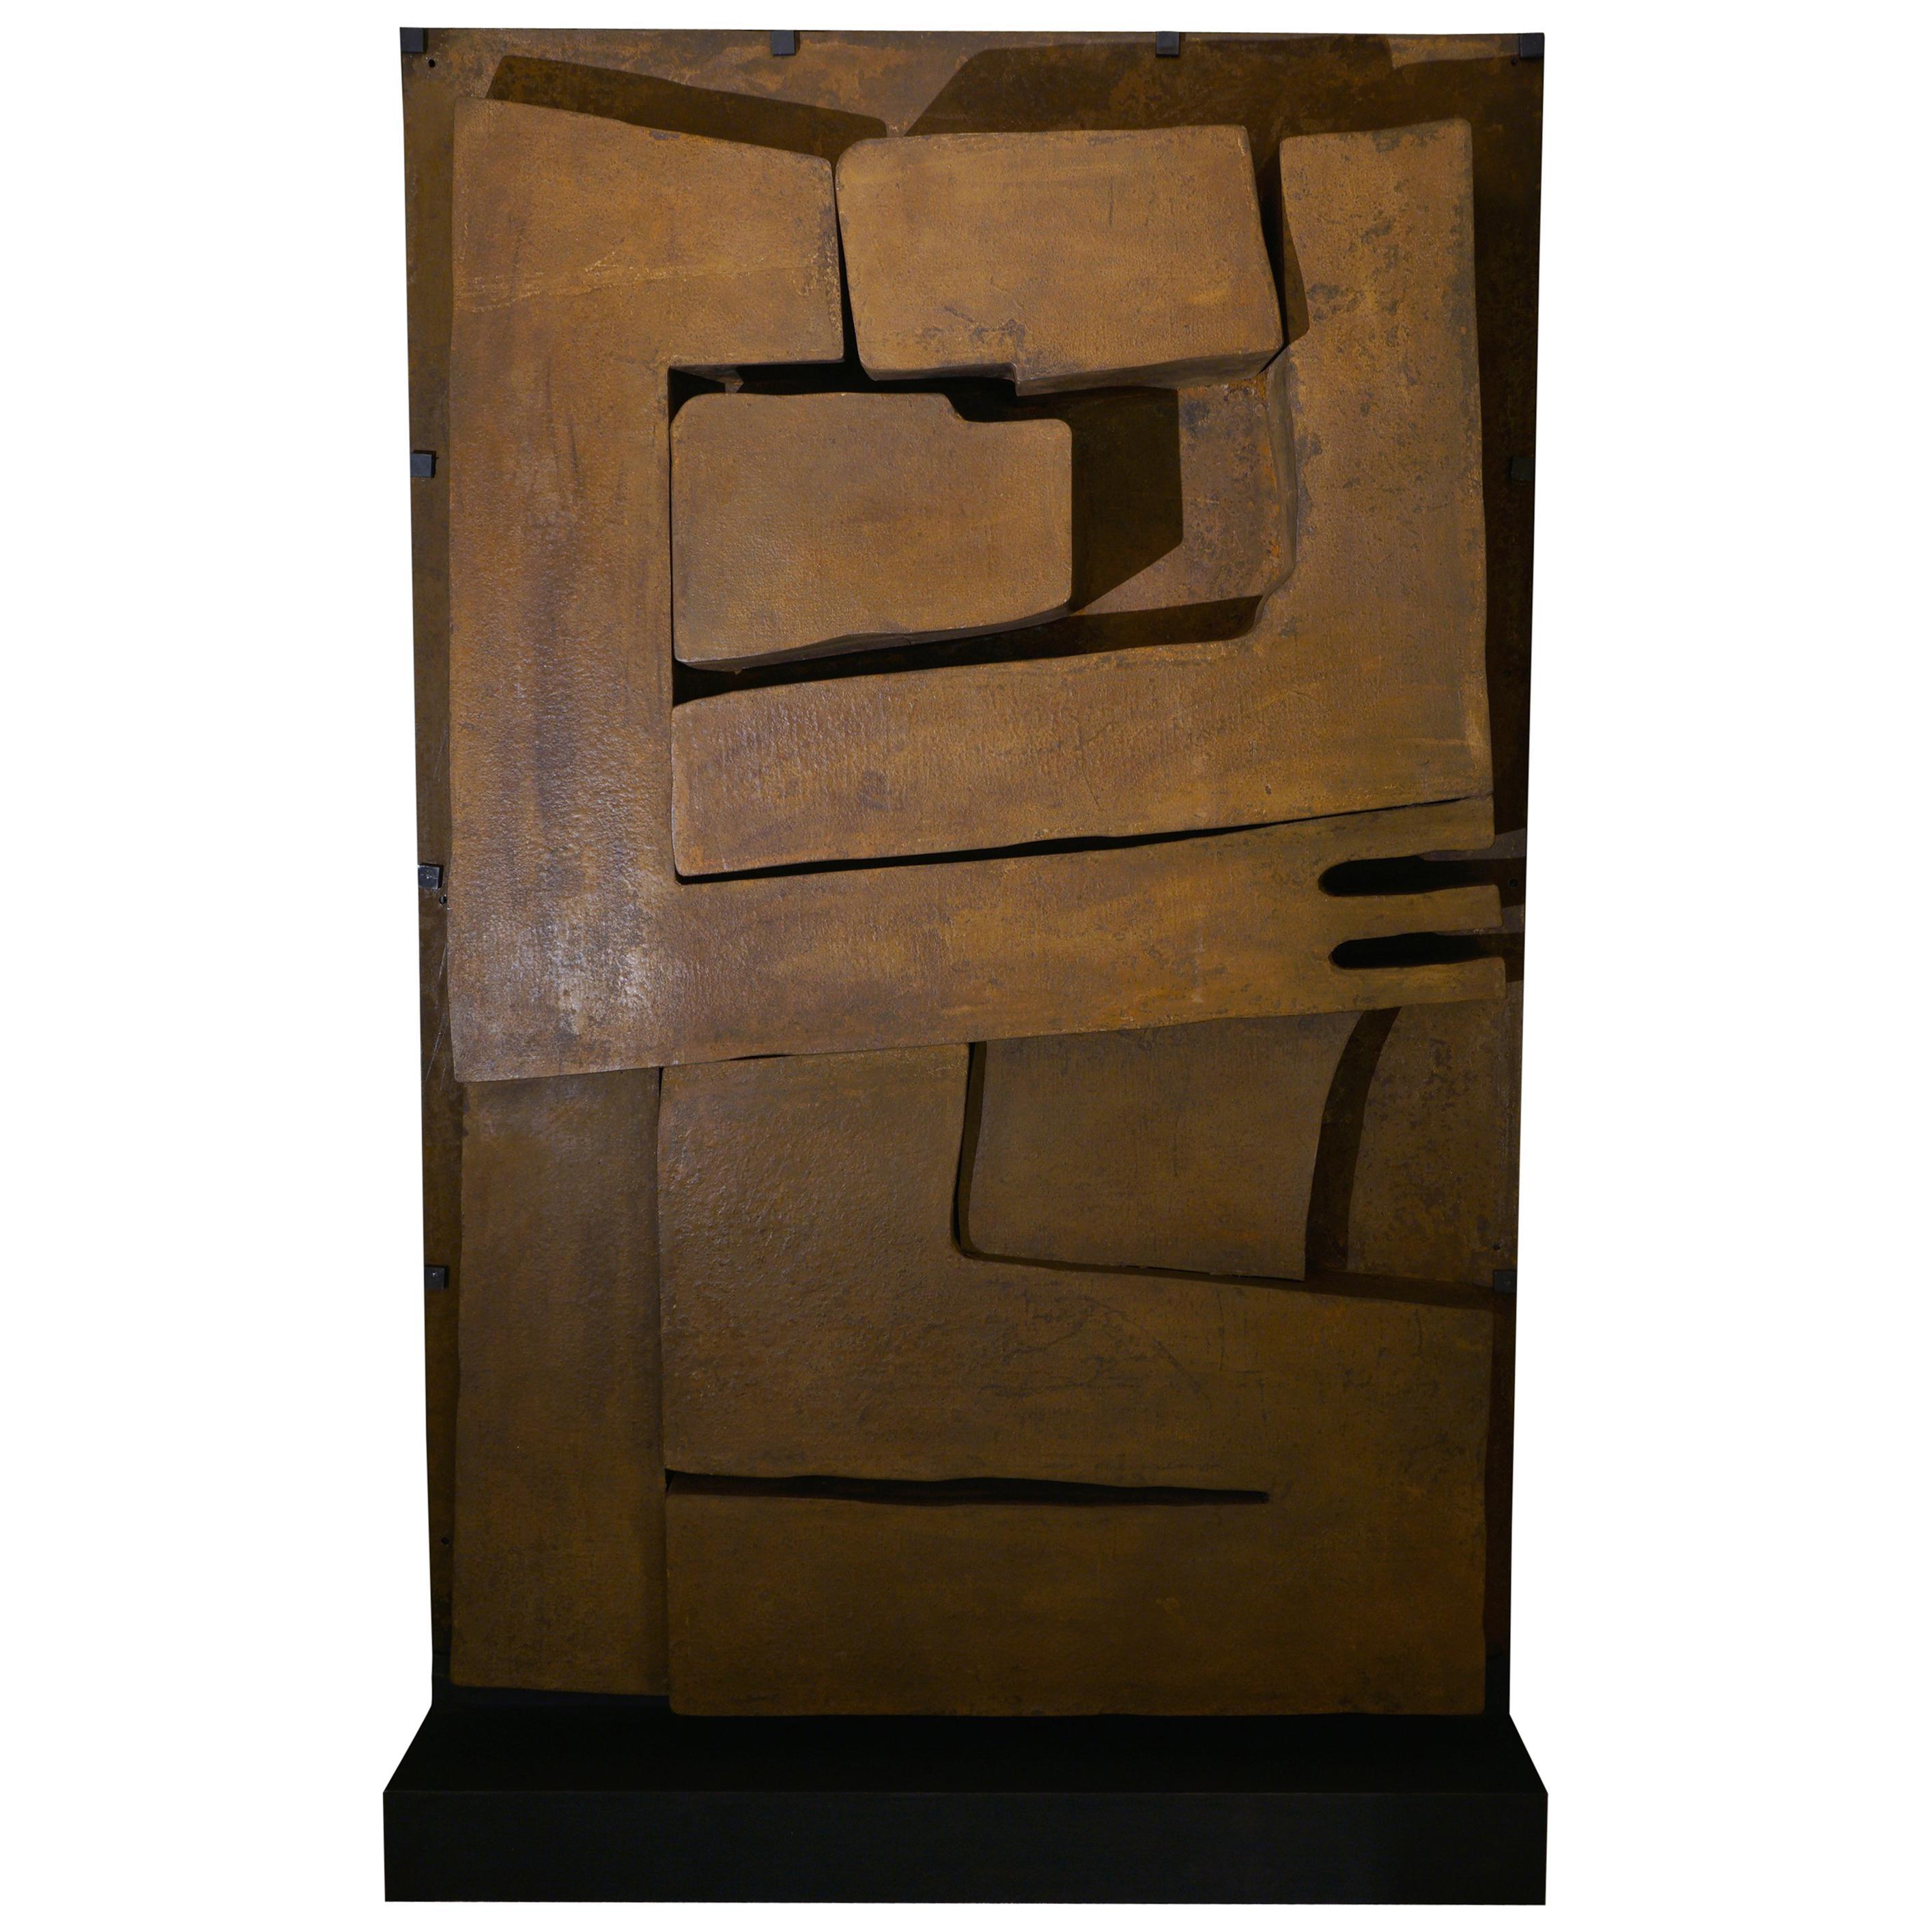 Freestanding Abstract Steel Sculpture, France, 1973